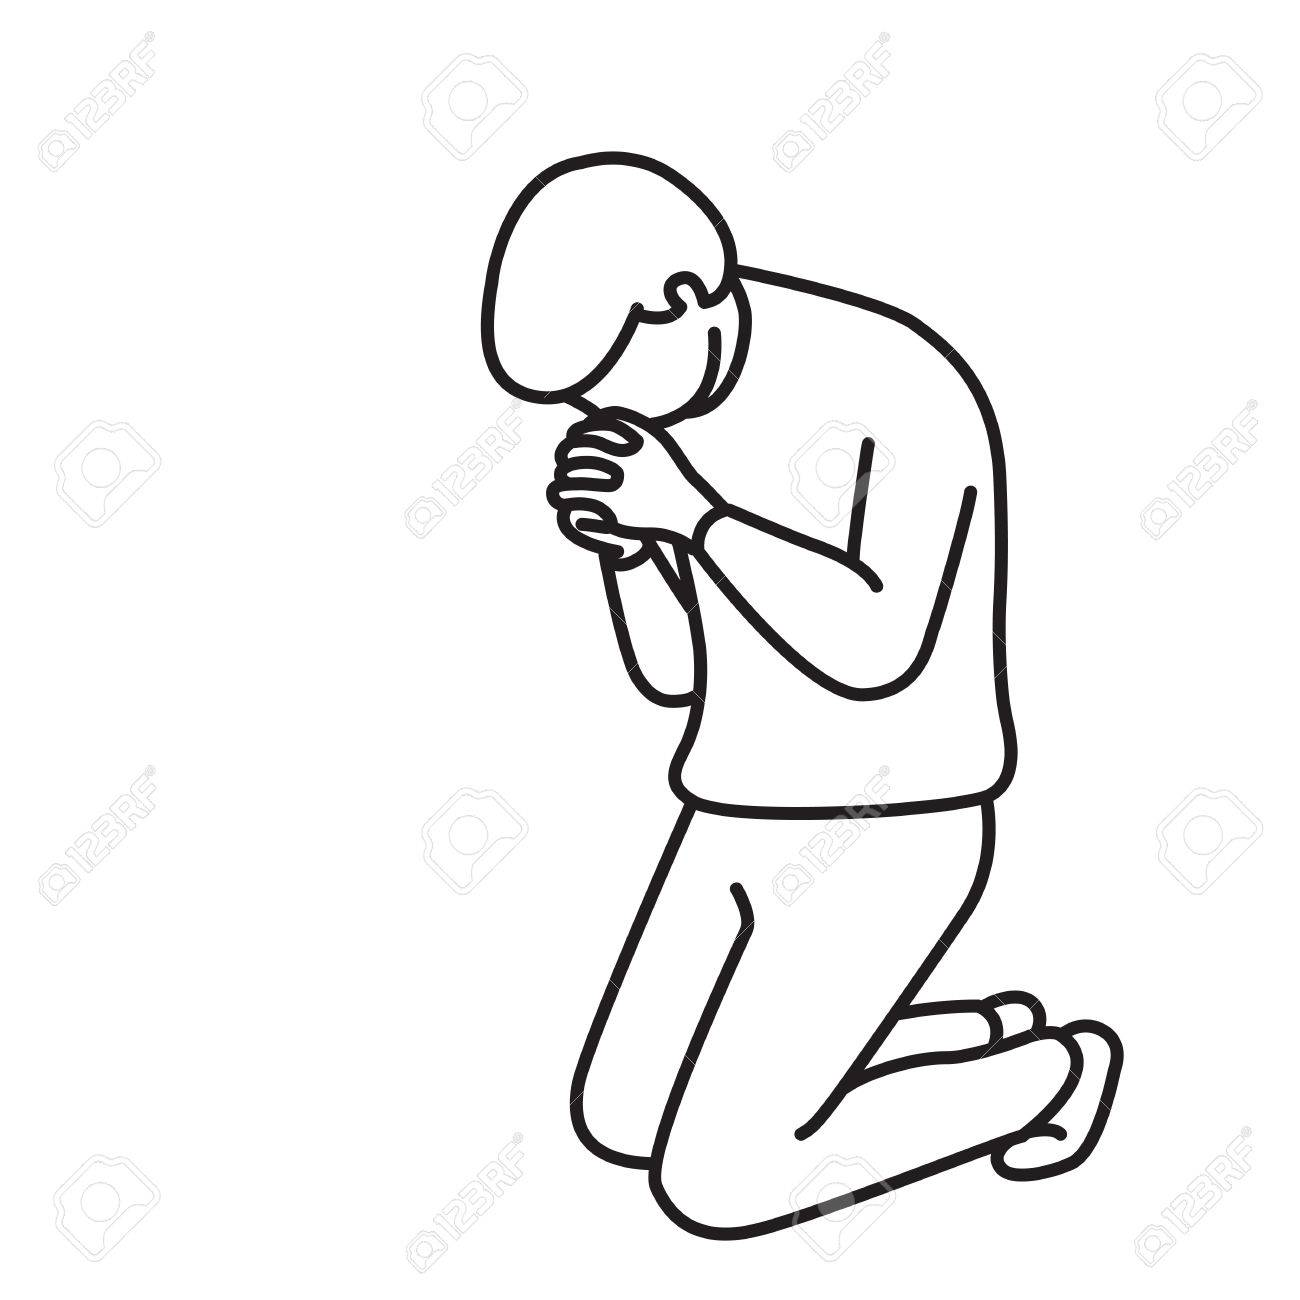 1300x1300 Vector Illustration Full Length Character Of Man, Kneeling Down